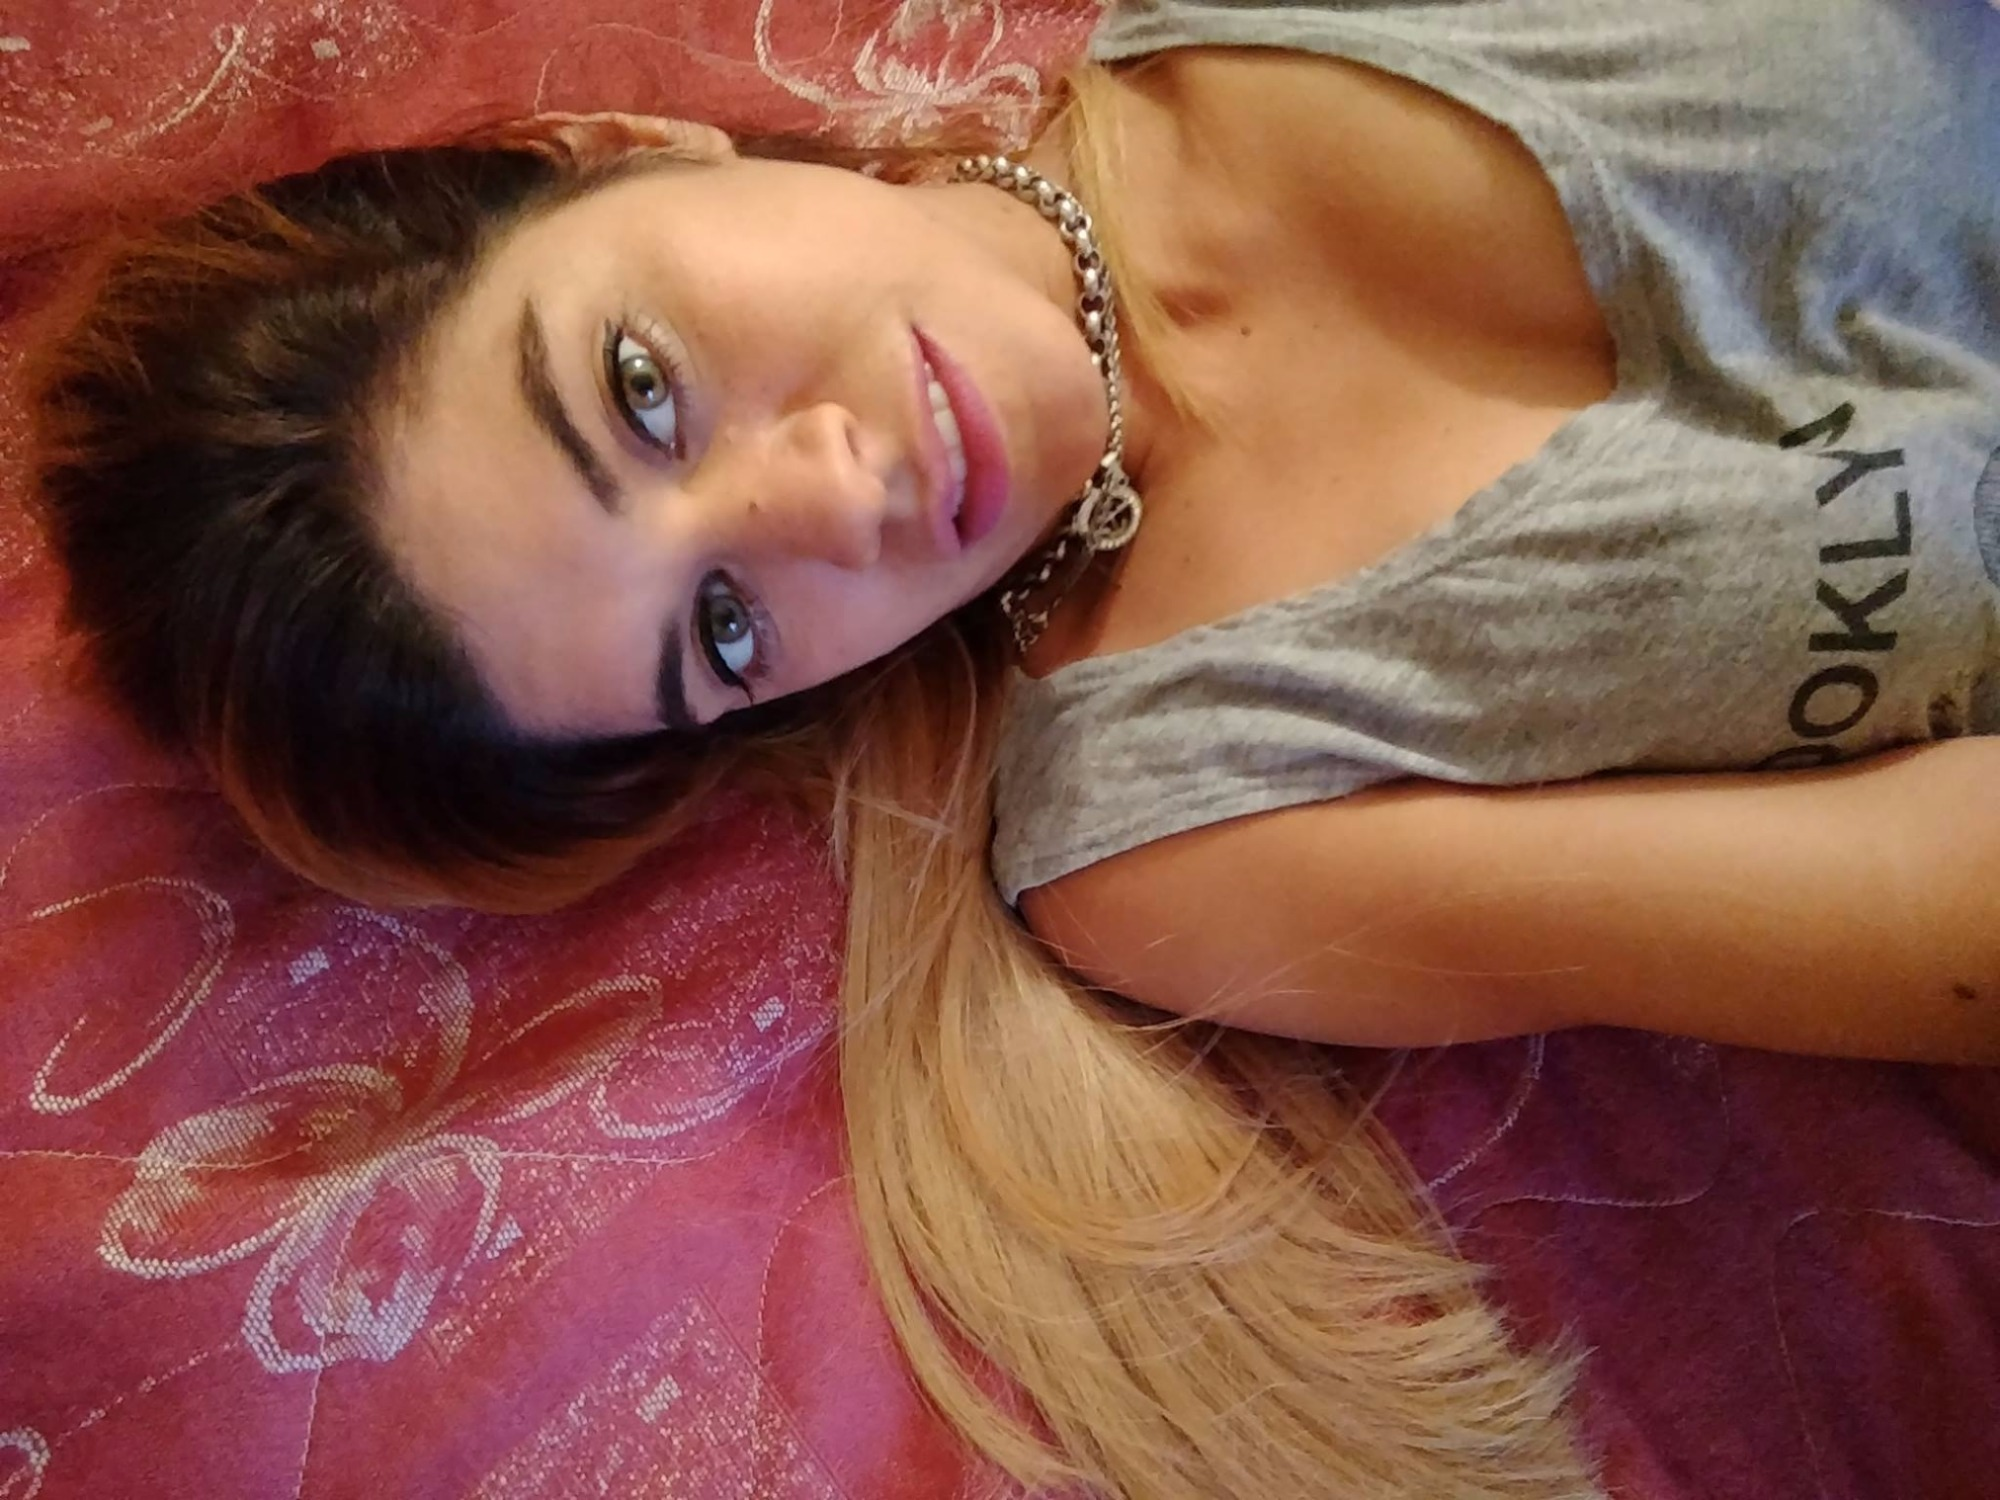 putas del instagram masaje jabonoso